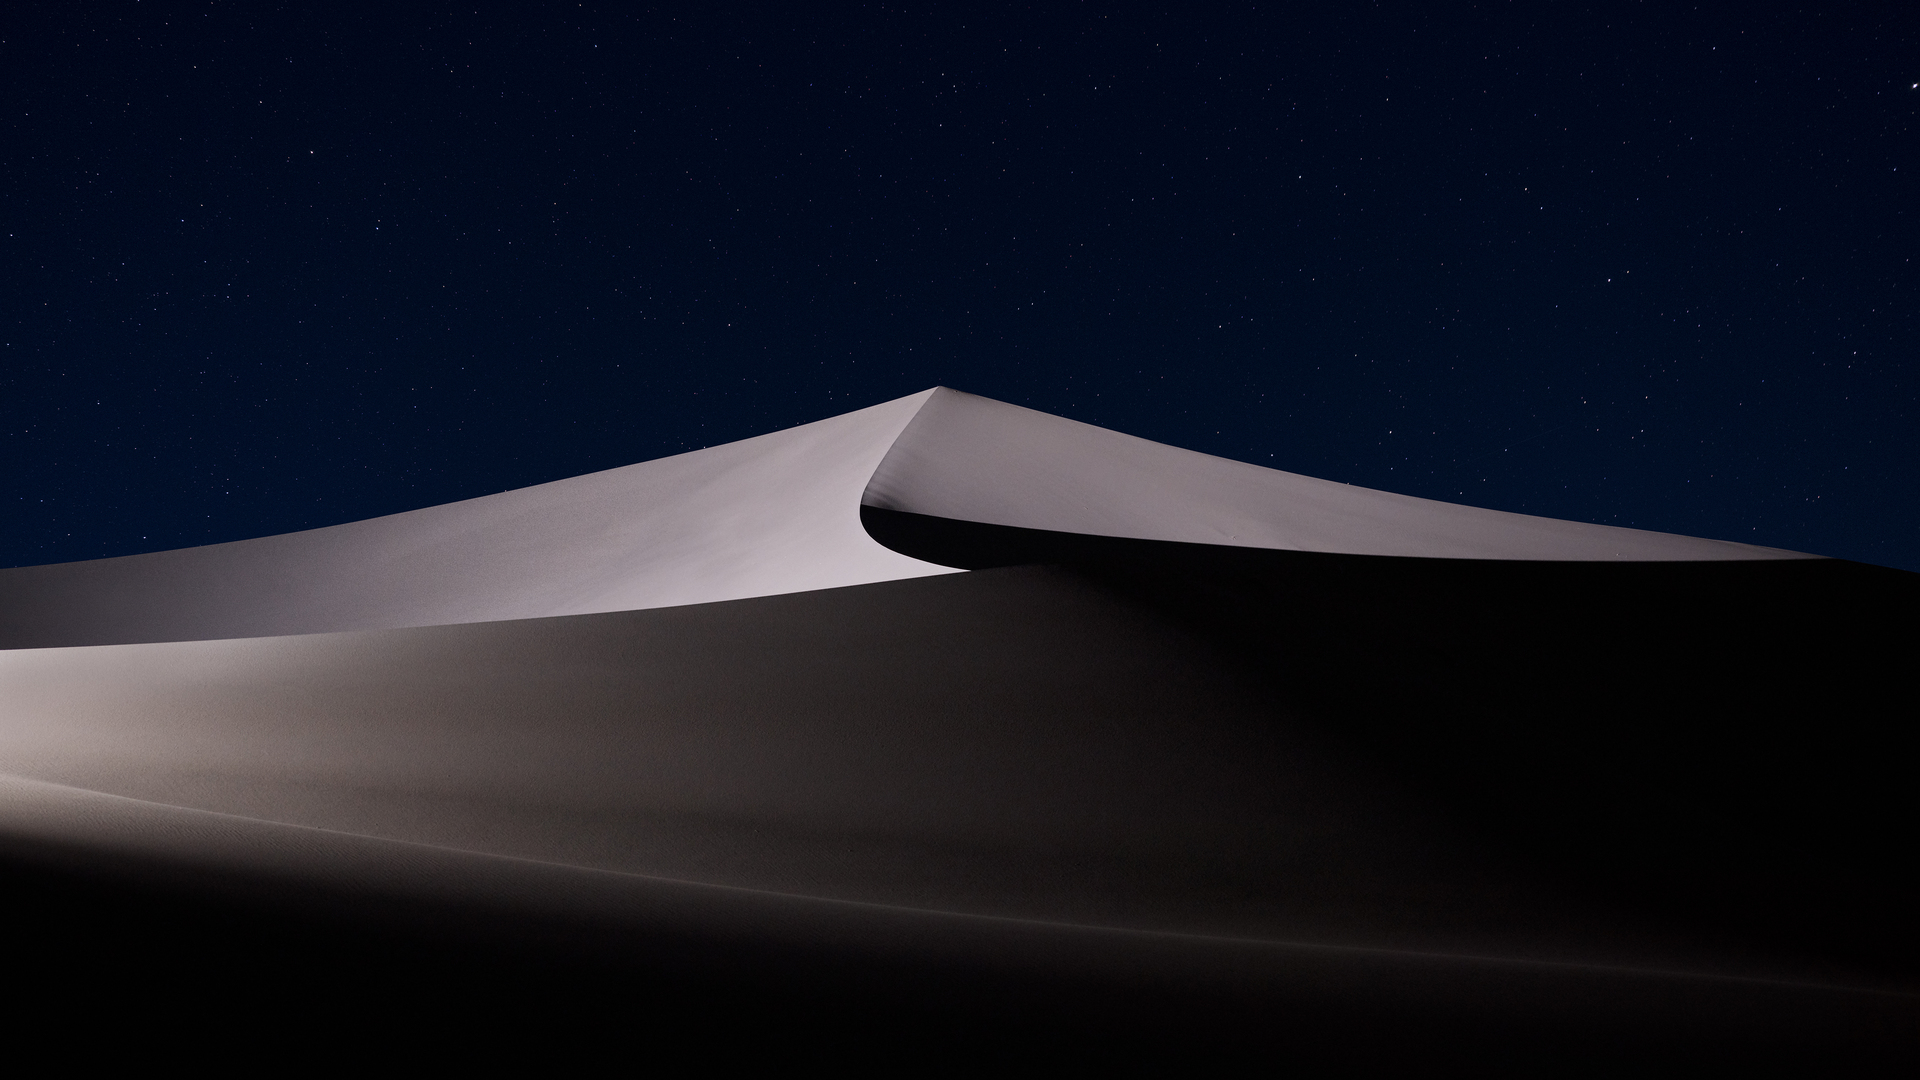 1920x1080 Desert Night Macos Mojave 5k Laptop Full Hd 1080p